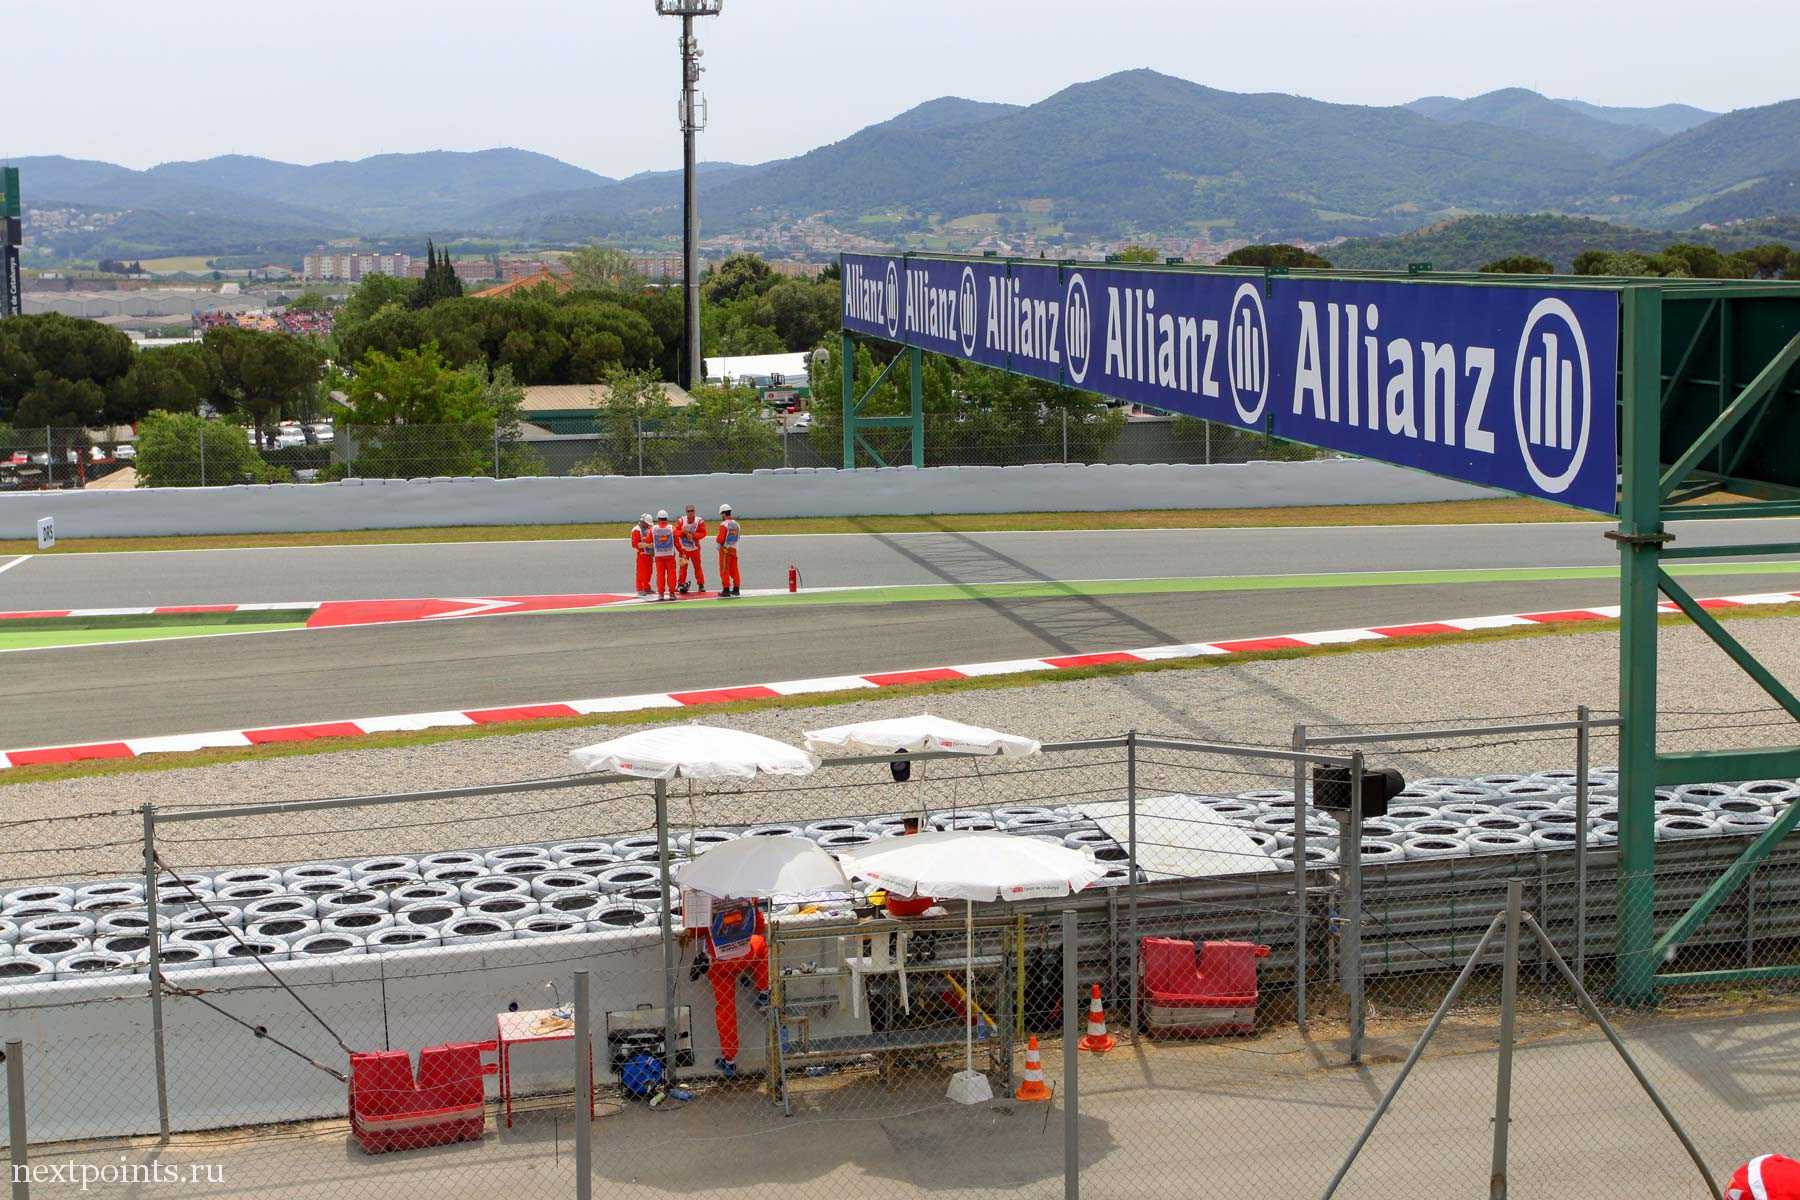 Вид с General Admission на трассу Формулы 1 в Испании